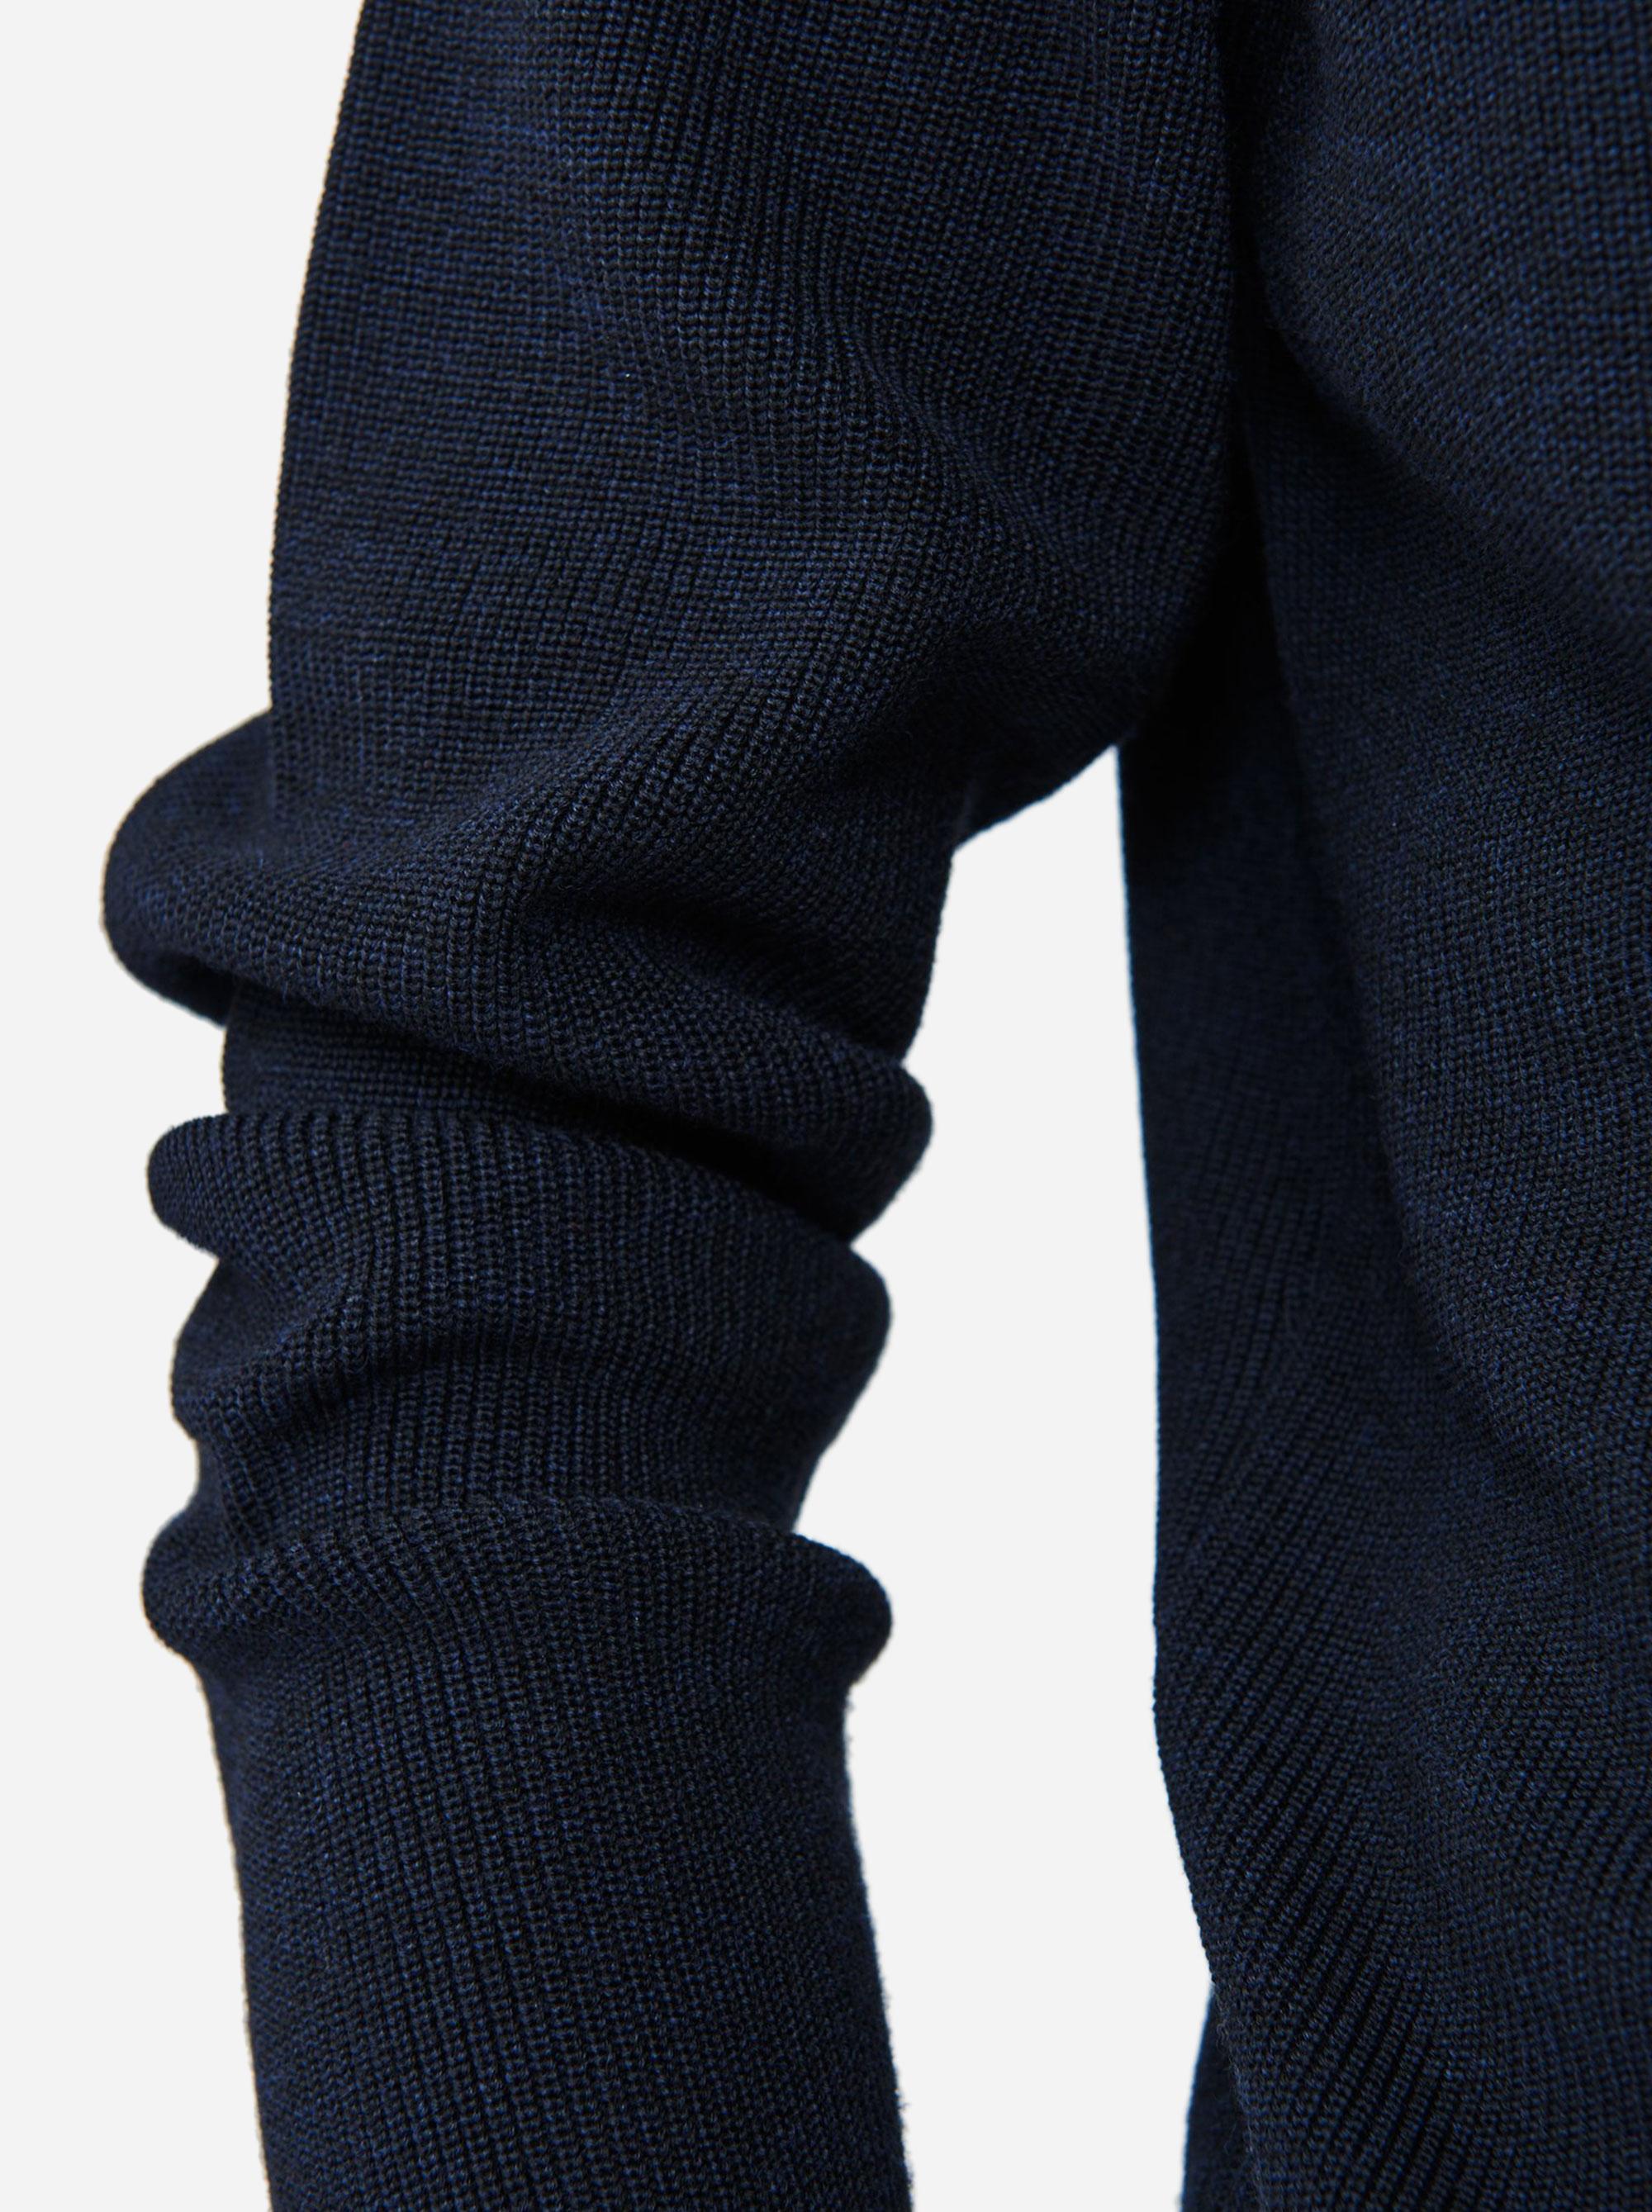 Teym - The Merino Sweater - Men - Blue - 4